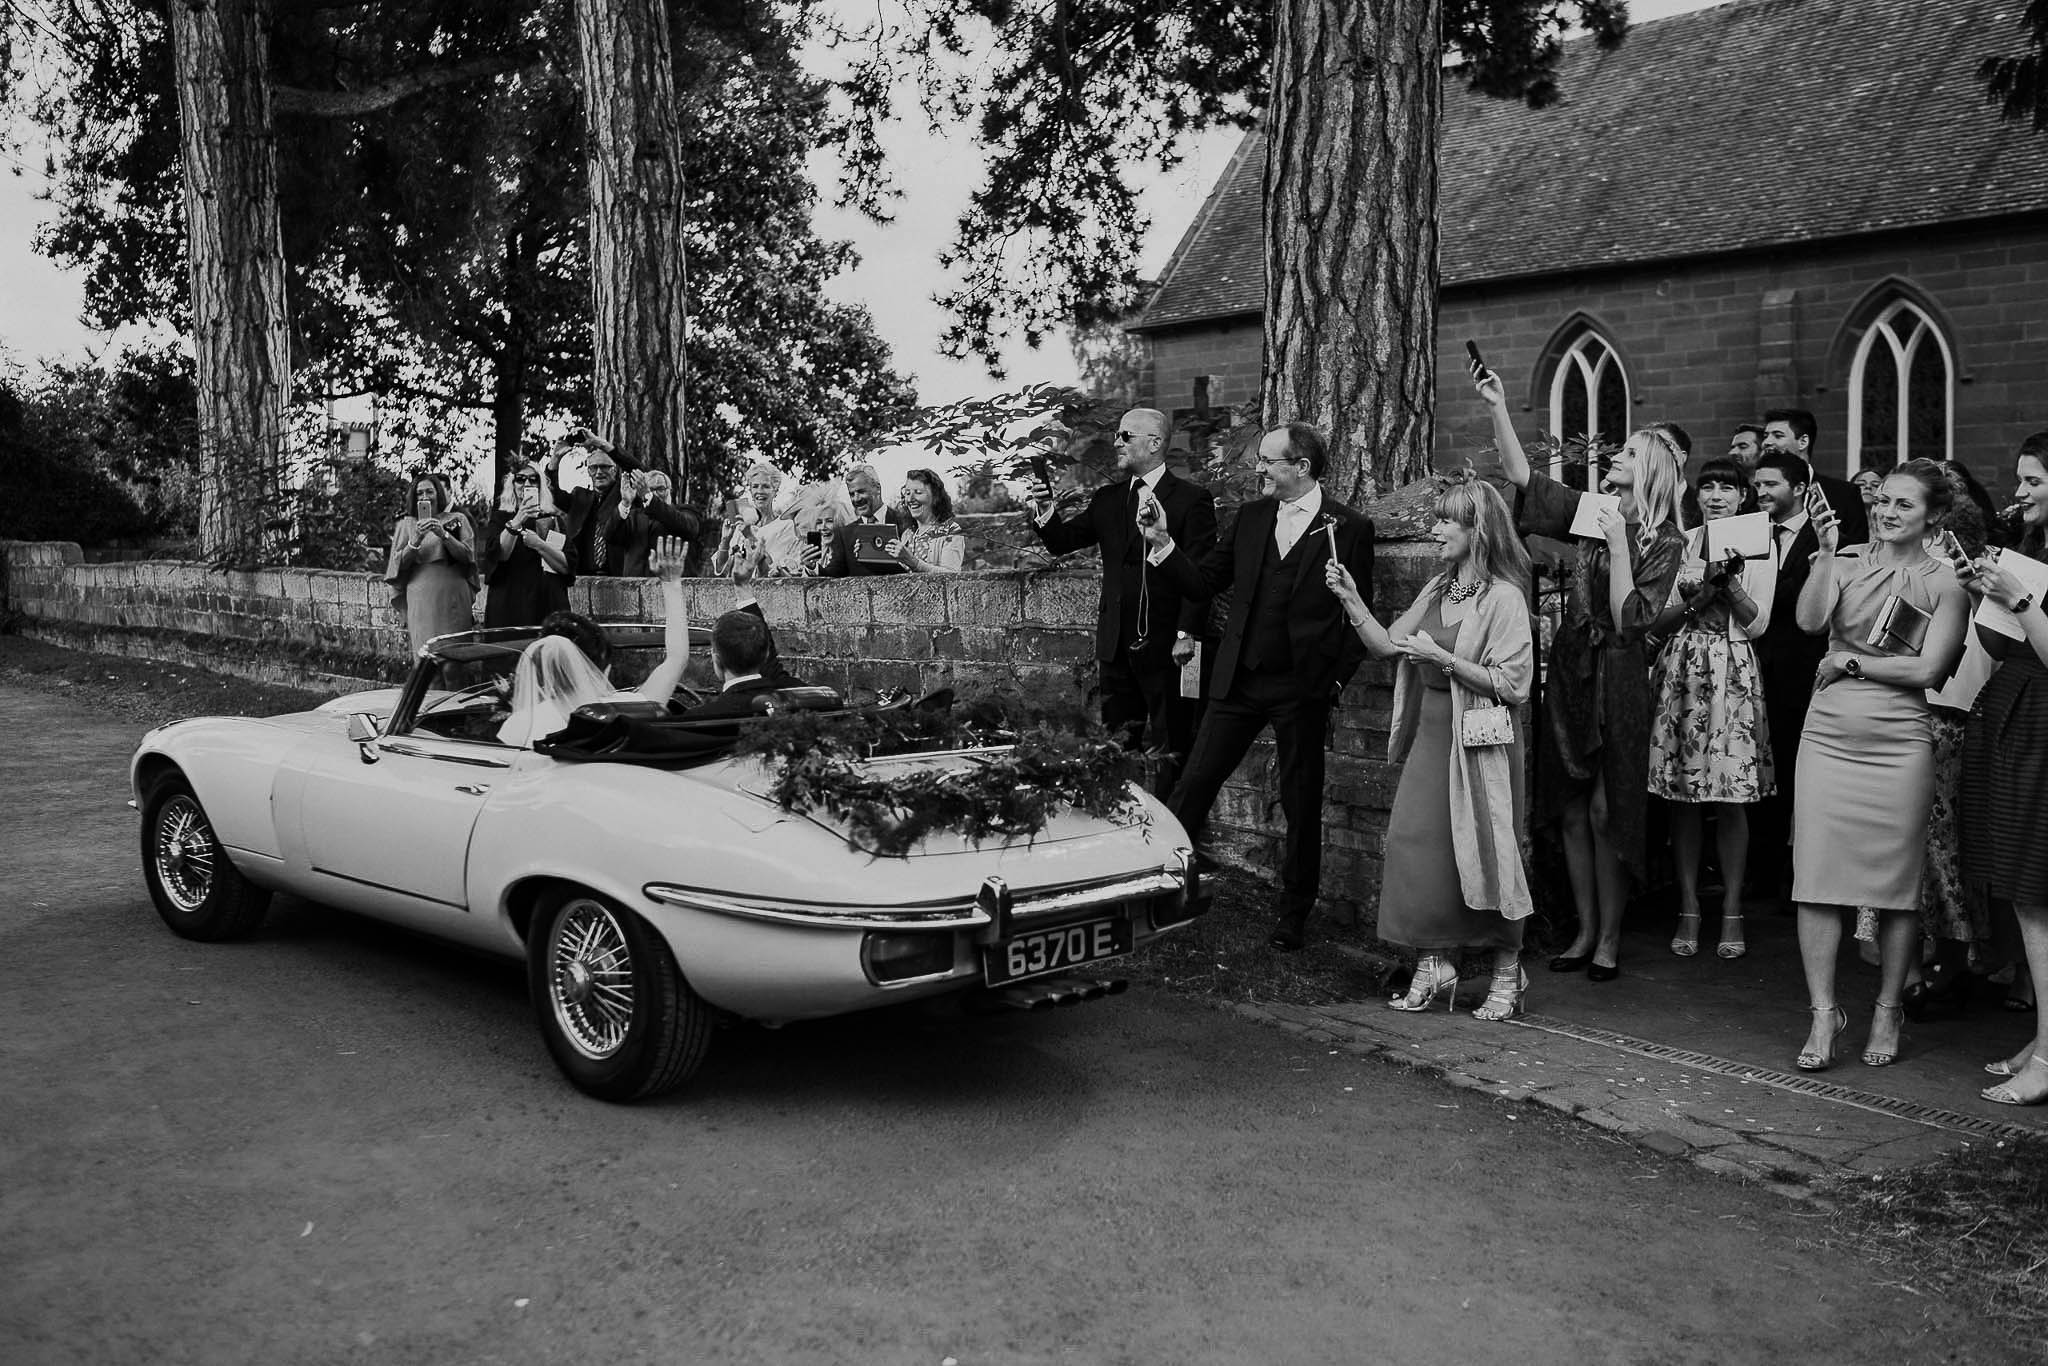 jaguar-e-type-wedding